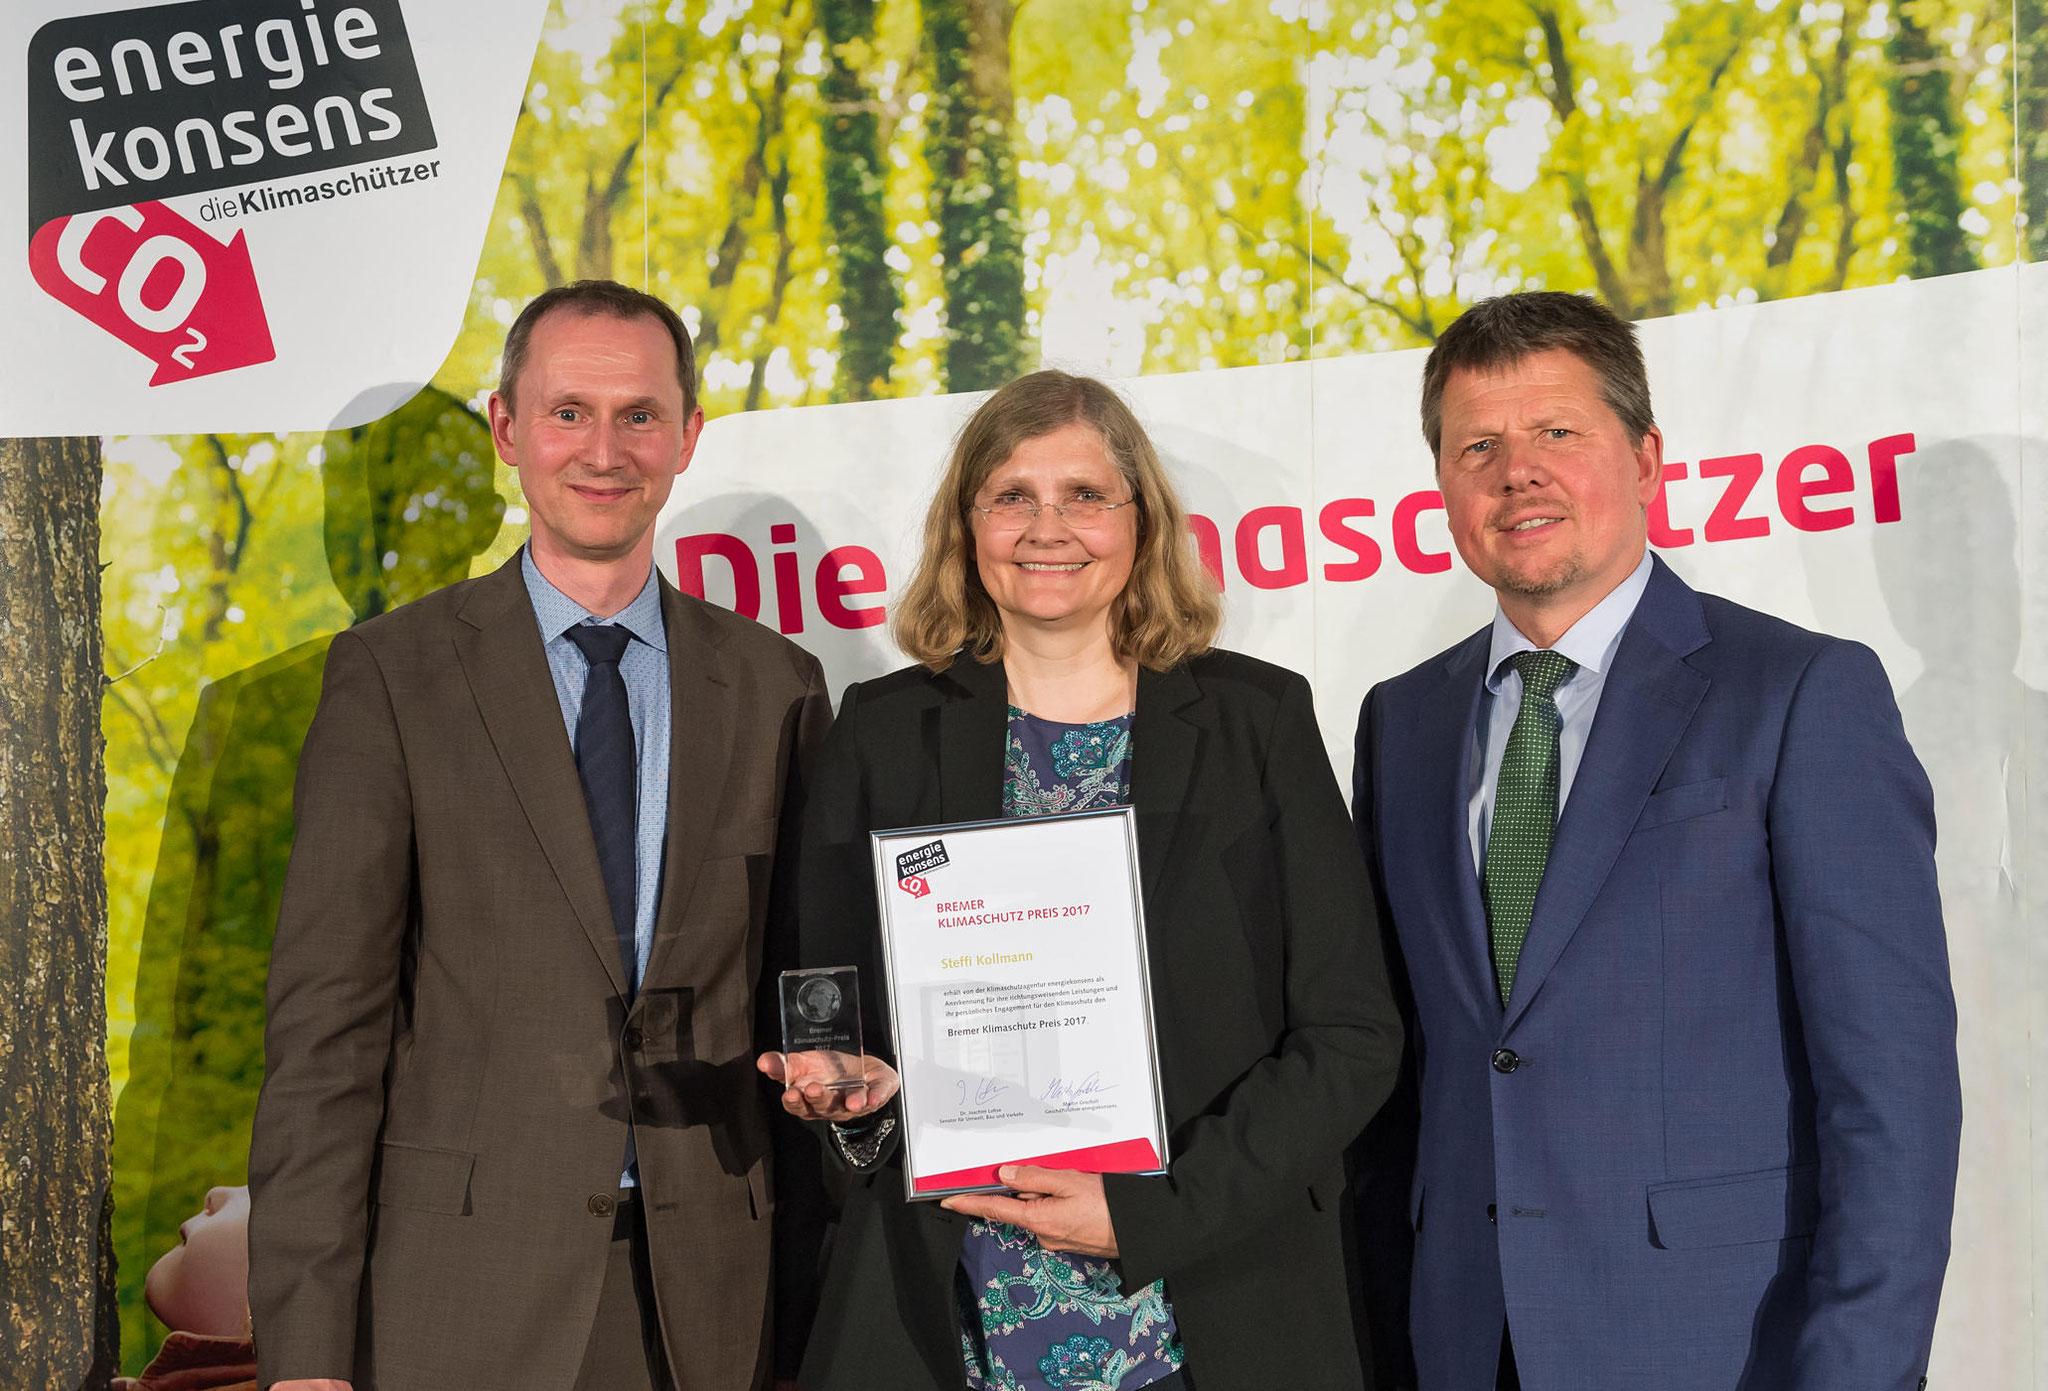 Preisträgerin Steffi Kollmann mit Umweltsenator Dr. Joachim Lohse (rechts) und Martin Grocholl (c) energiekonsens